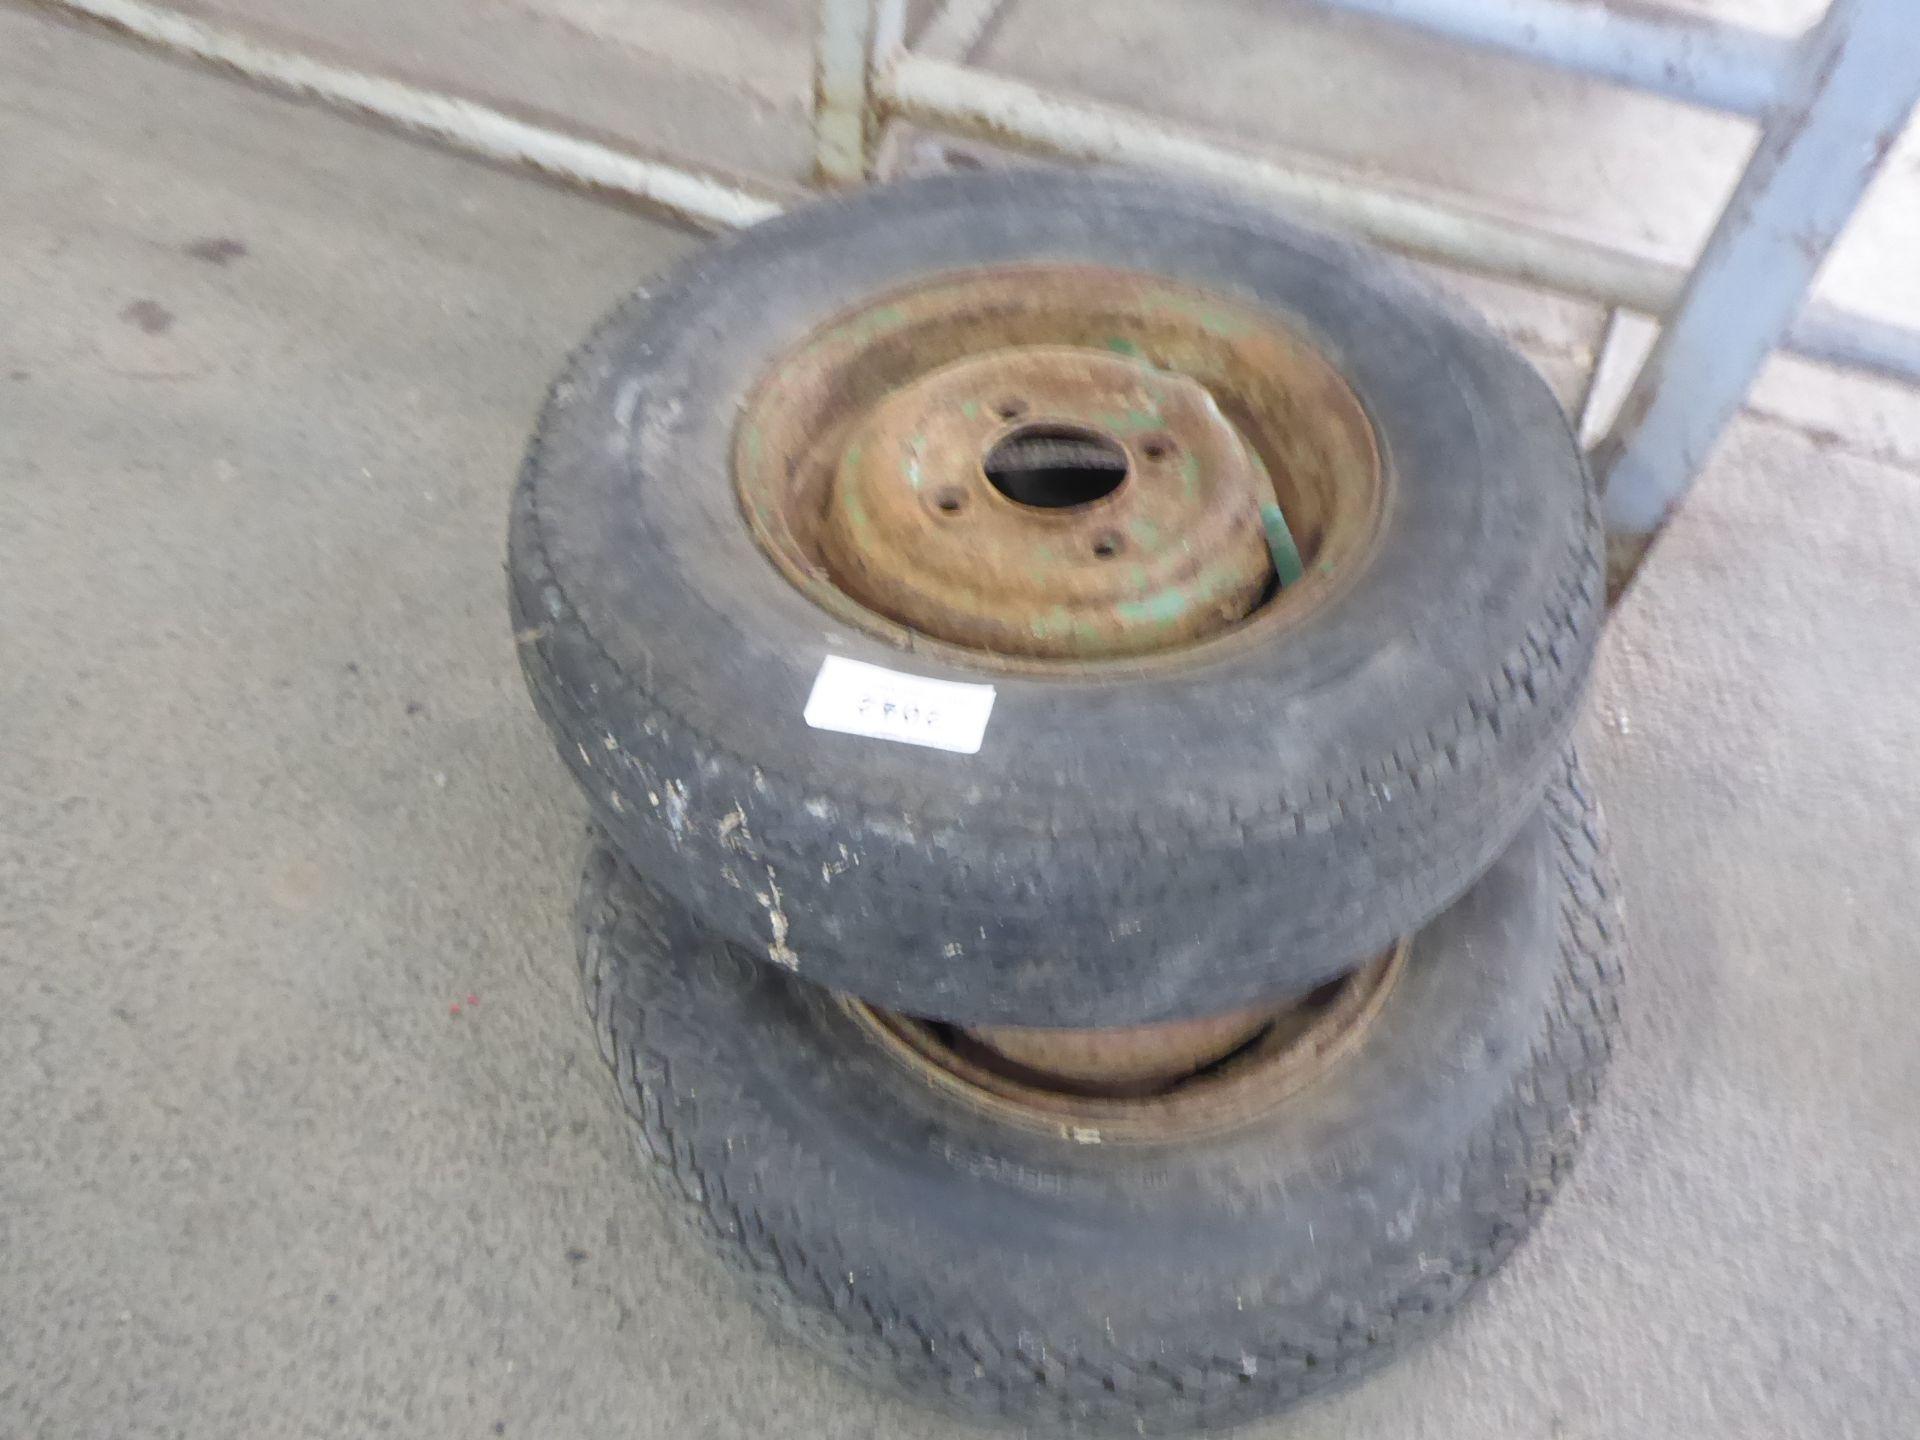 Lotto 2042 - Pair of original vintage Mini wheels